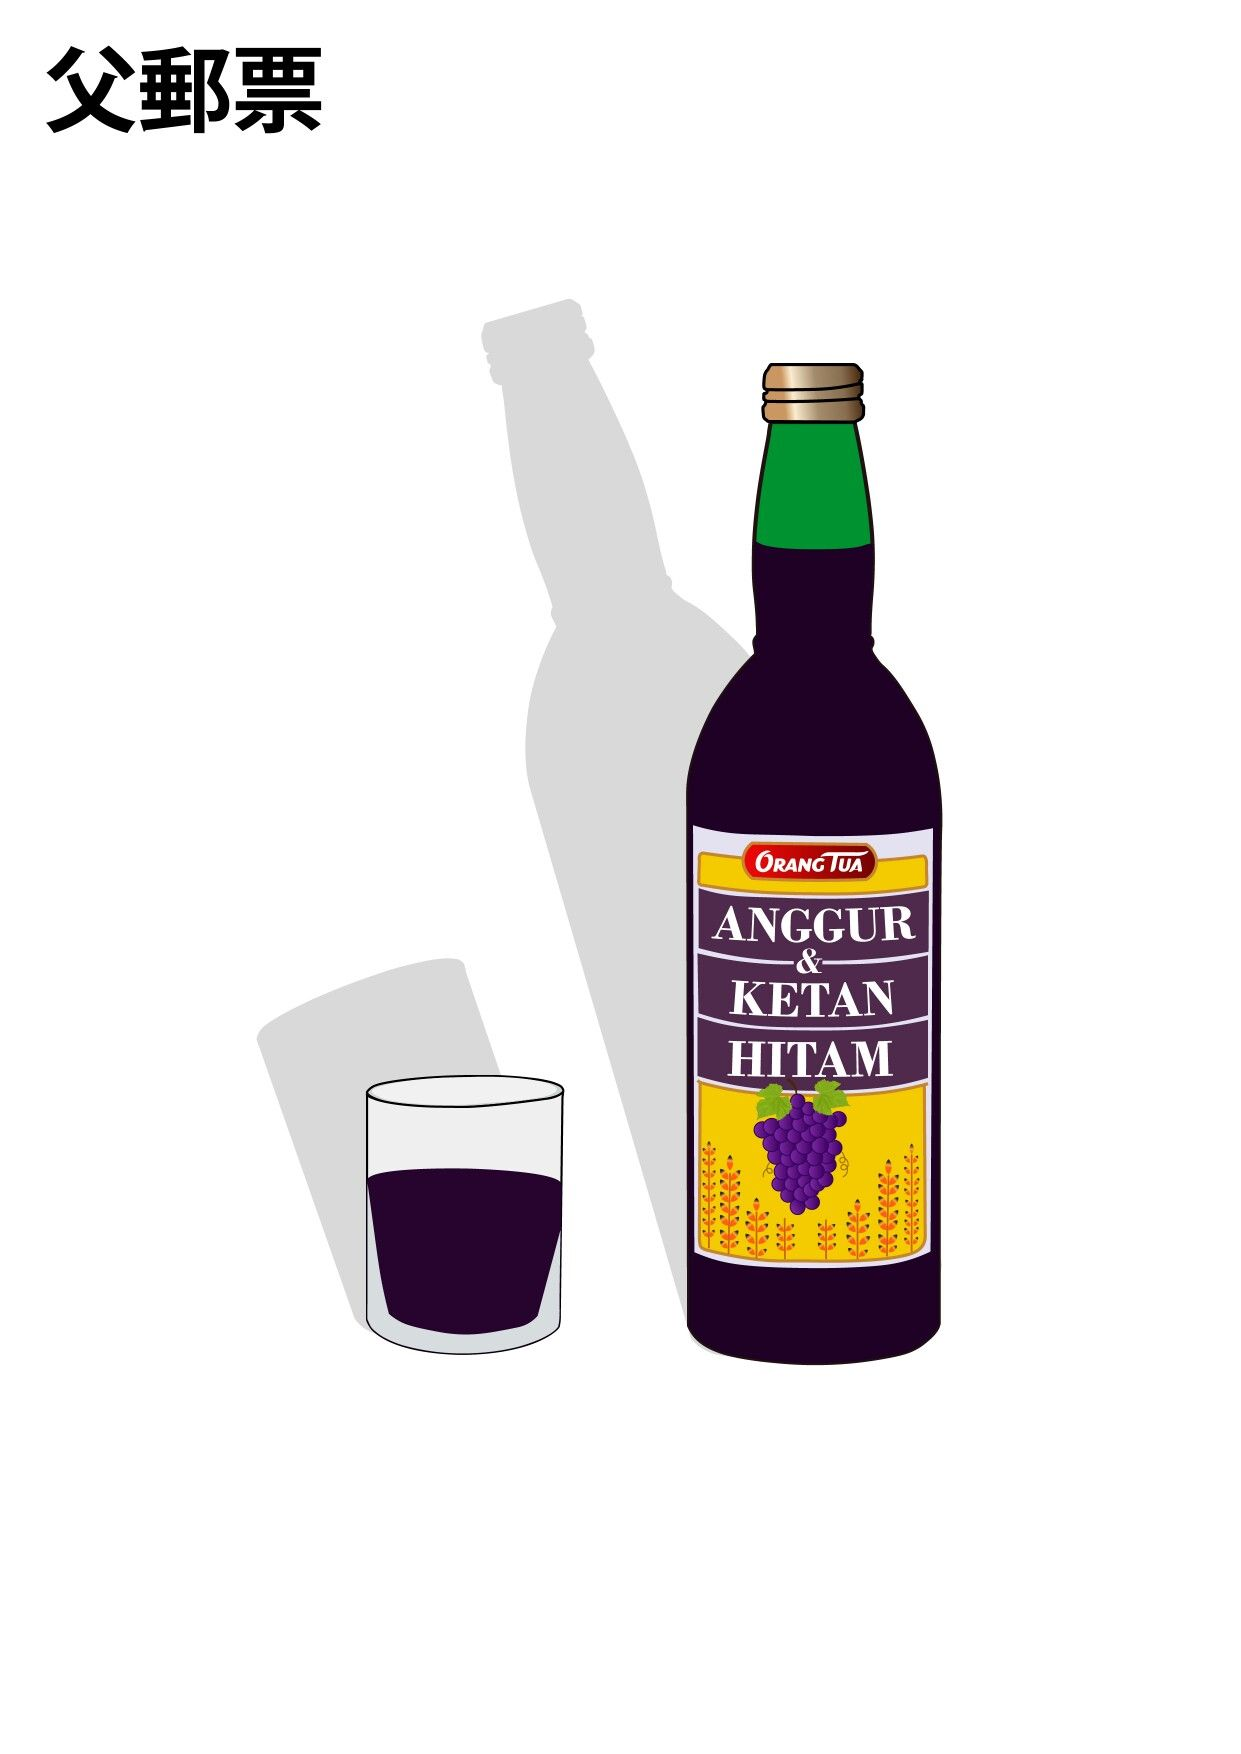 Anggur Orang Tua Logo : anggur, orang, Vector, Orang, Anggur,, Anggur, Merah,, Alkohol